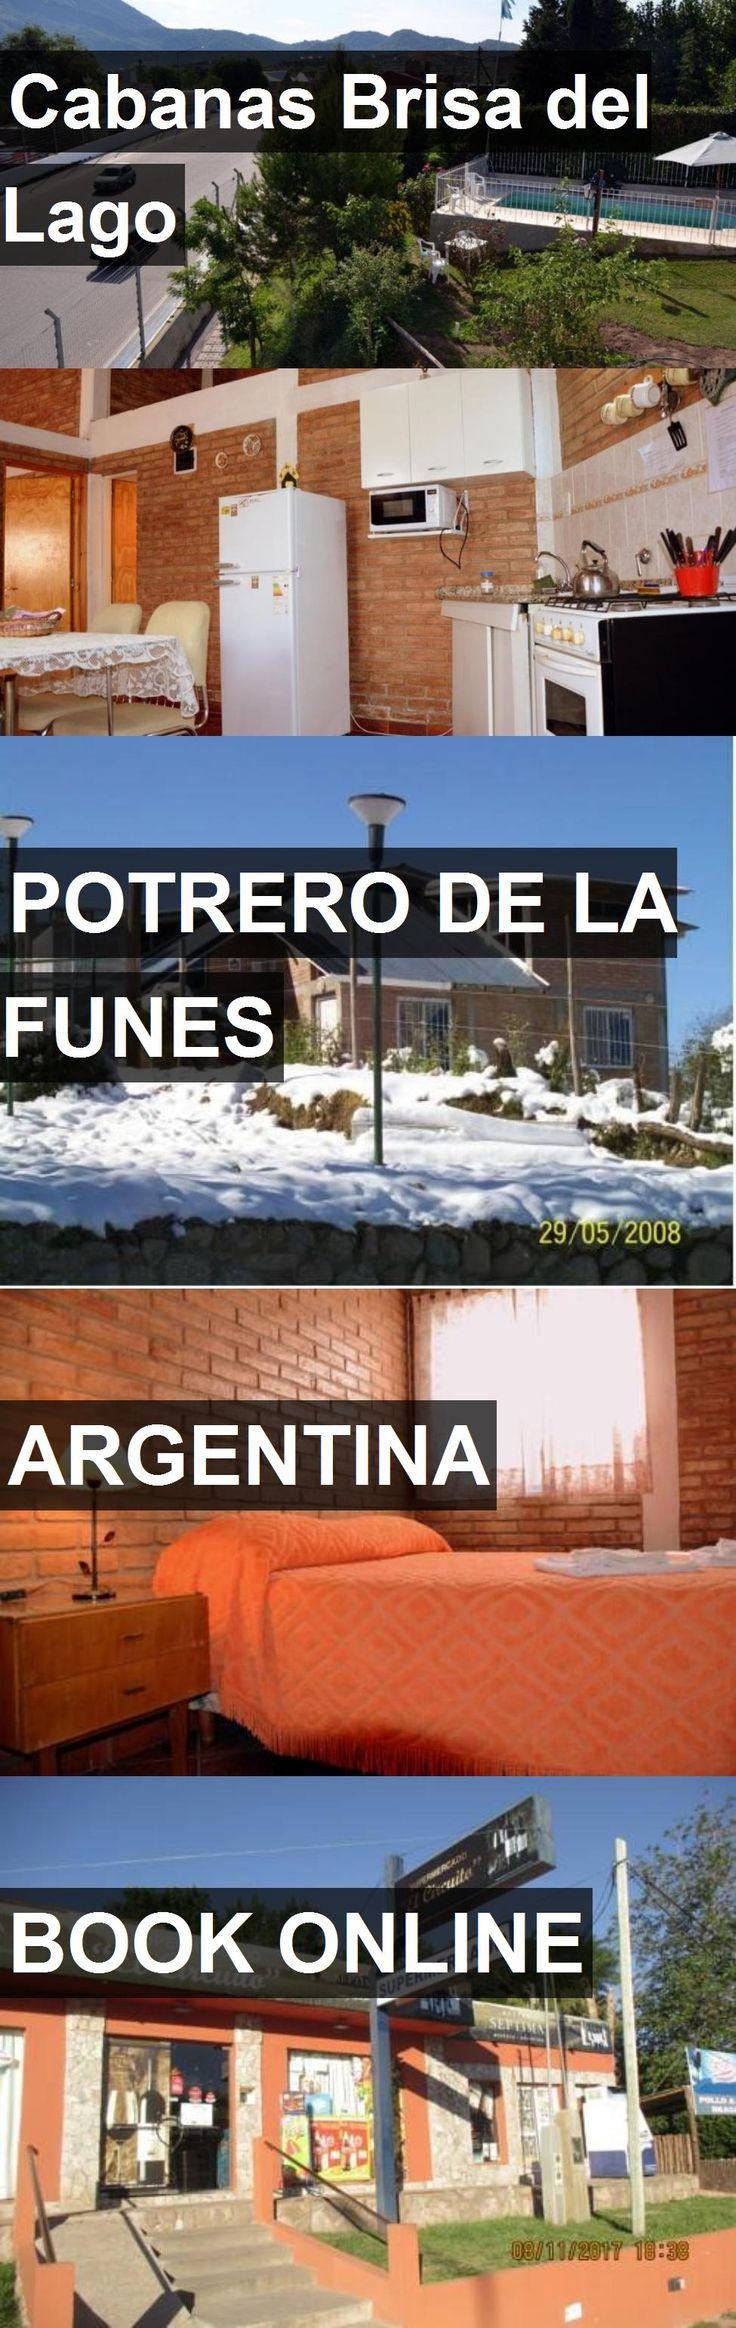 Hotel Cabanas Brisa del Lago in Potrero de la Funes, Argentina. For more information, photos, reviews and best prices please follow the link. #Argentina #PotrerodelaFunes #CabanasBrisadelLago #hotel #travel #vacation